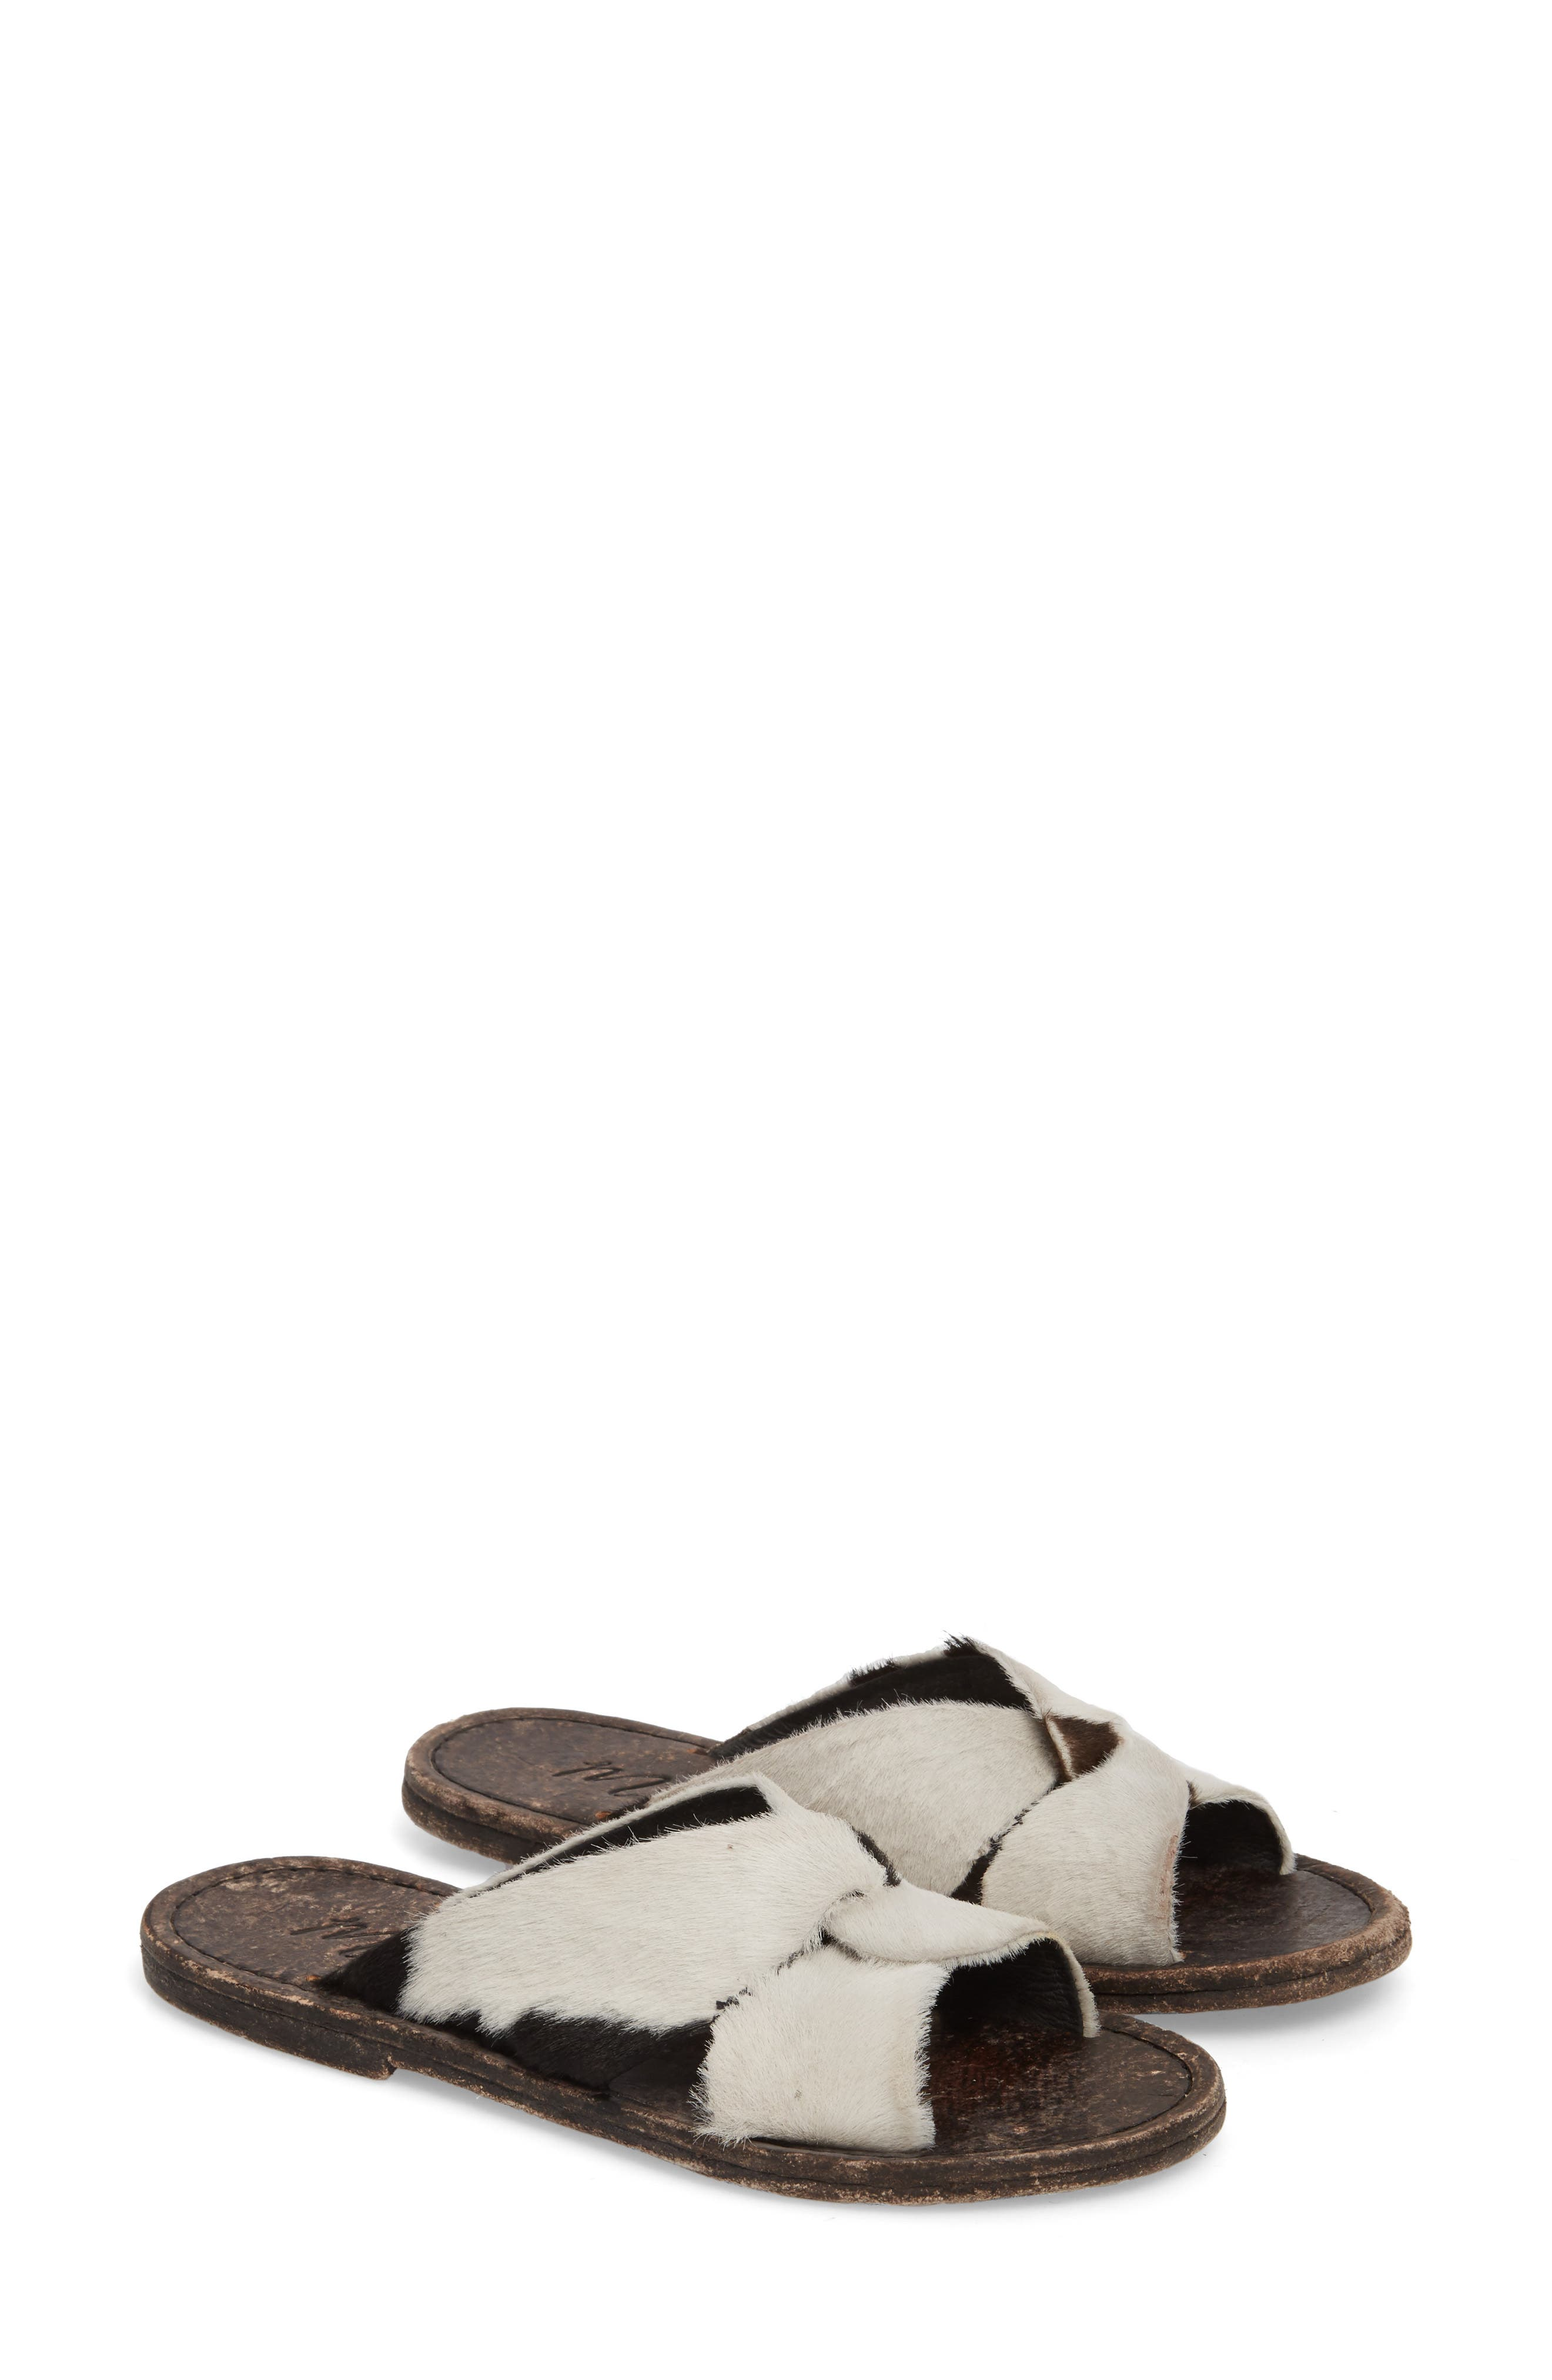 Alamosa Genuine Calf Hair Sandal,                         Main,                         color, Black/ White